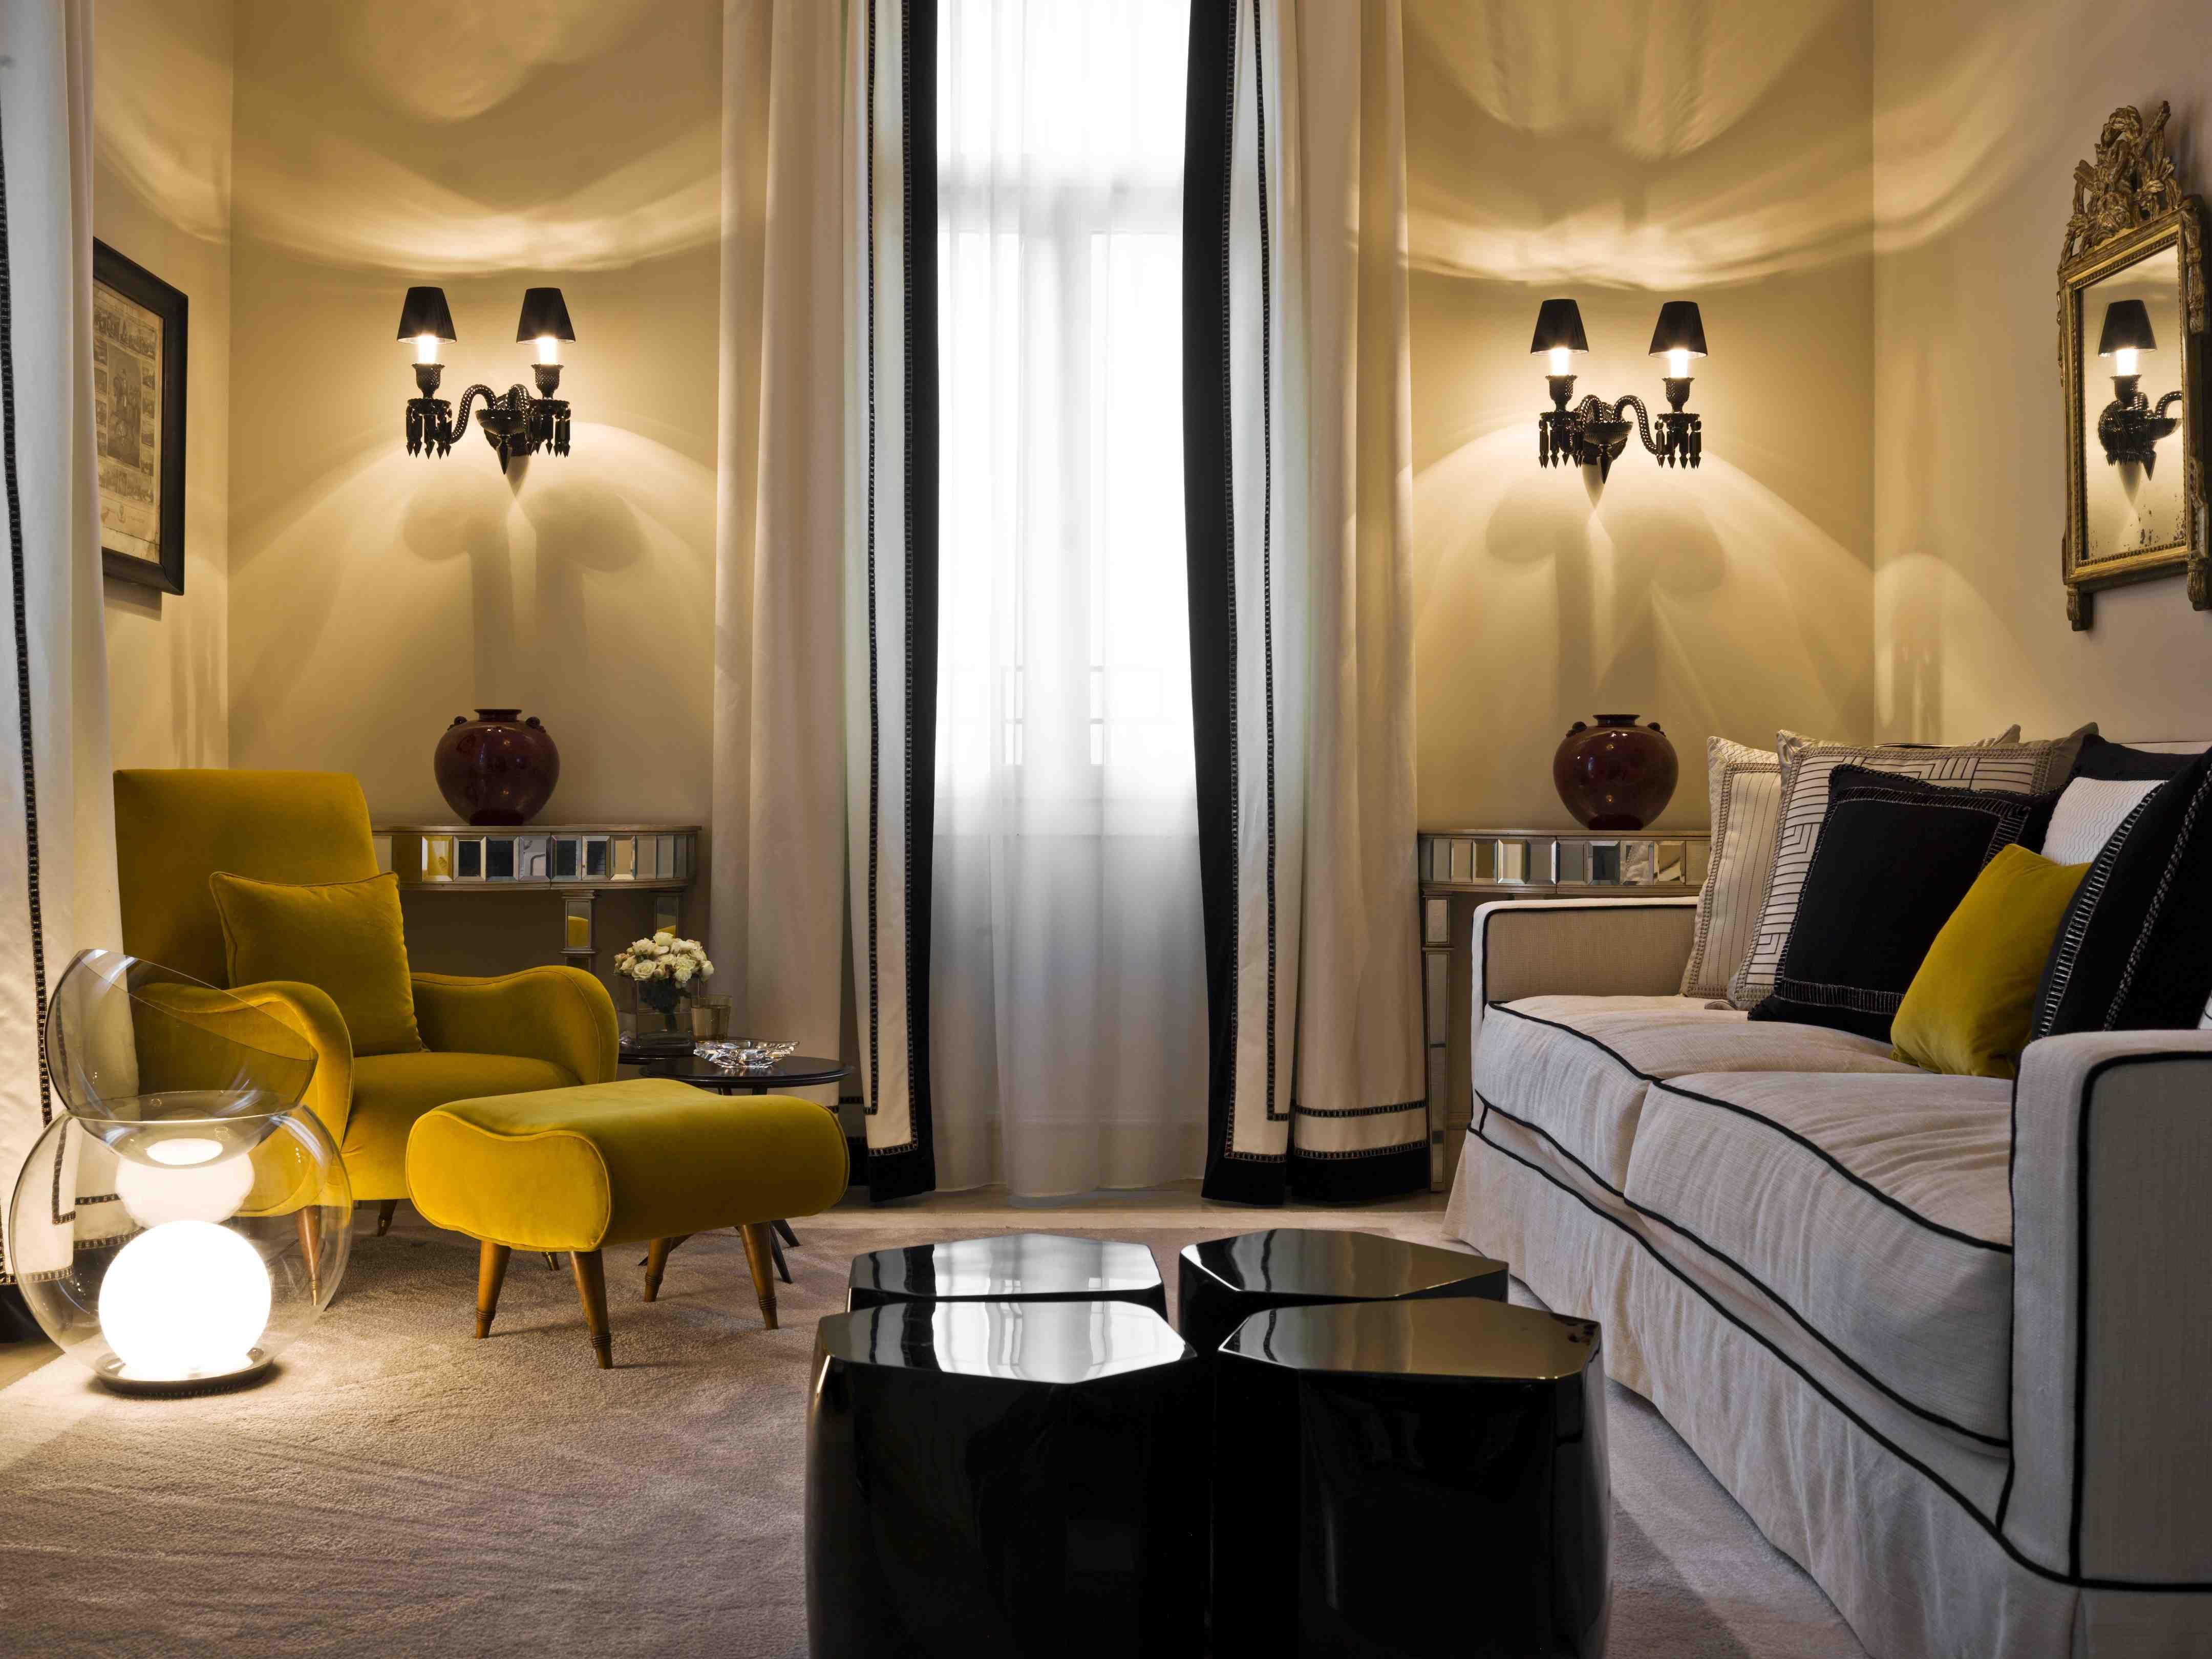 Living Room Chiara Provasi Chiara Provasi Pinterest